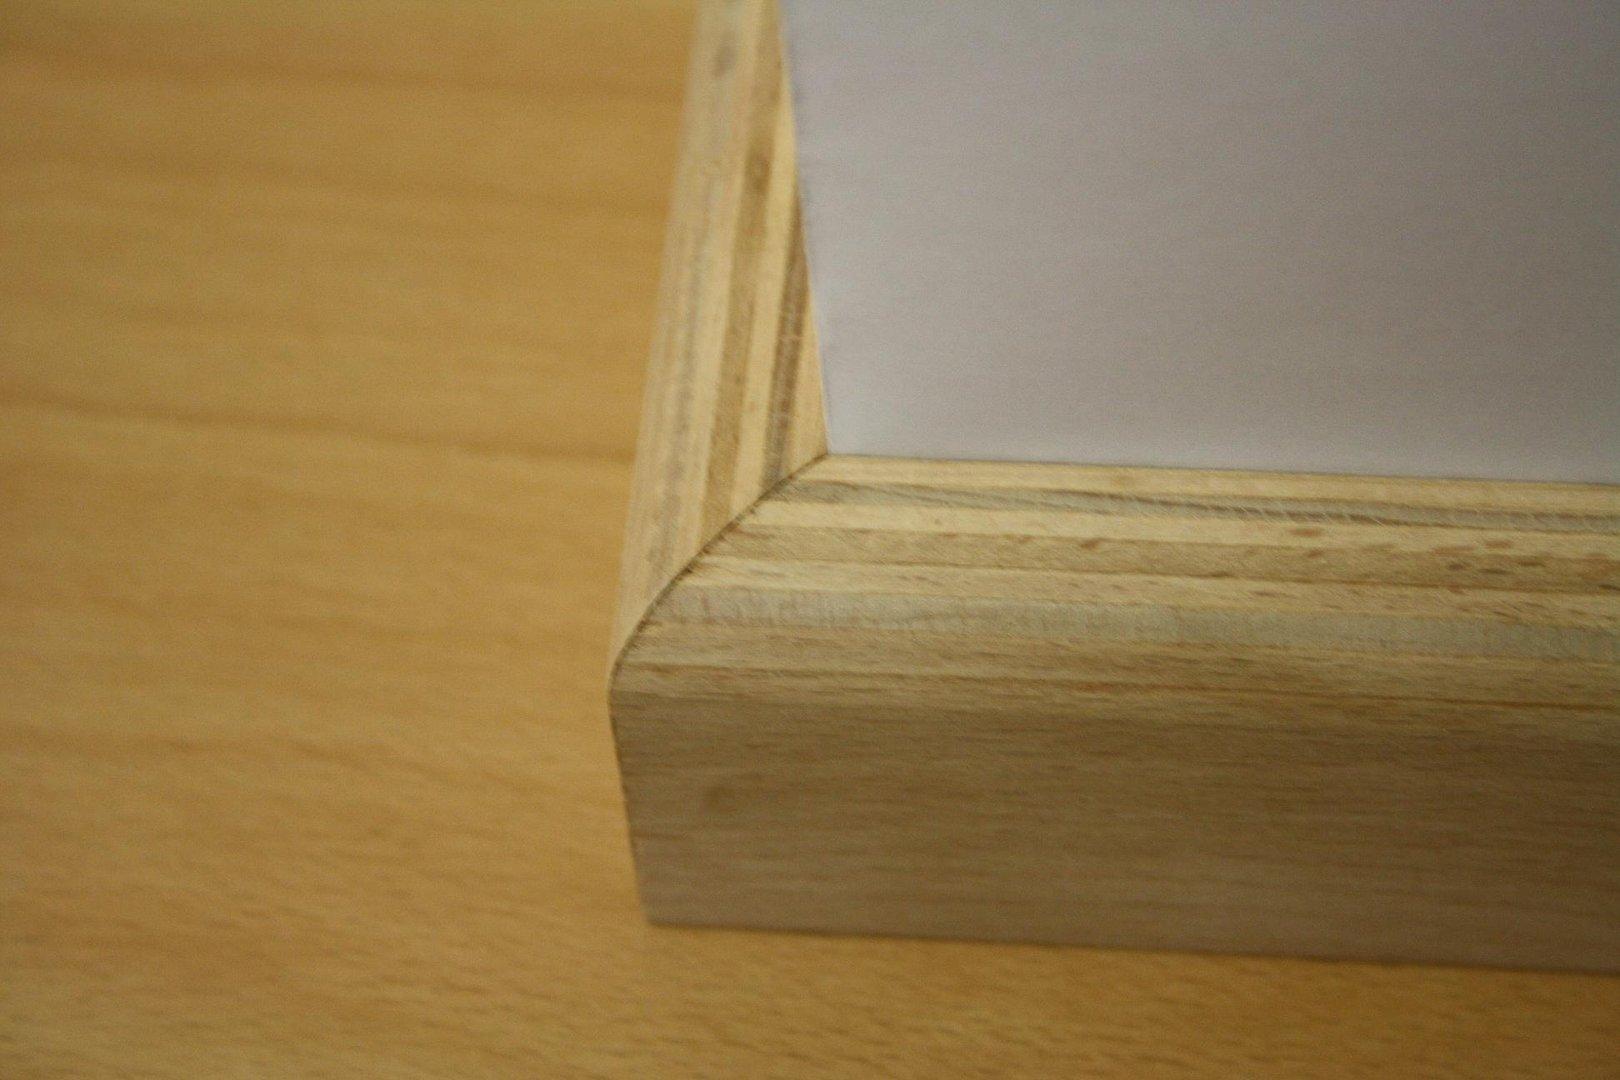 fu leisten buche schichtholz roh 5 oder 6 cm h he fachhandel f r. Black Bedroom Furniture Sets. Home Design Ideas